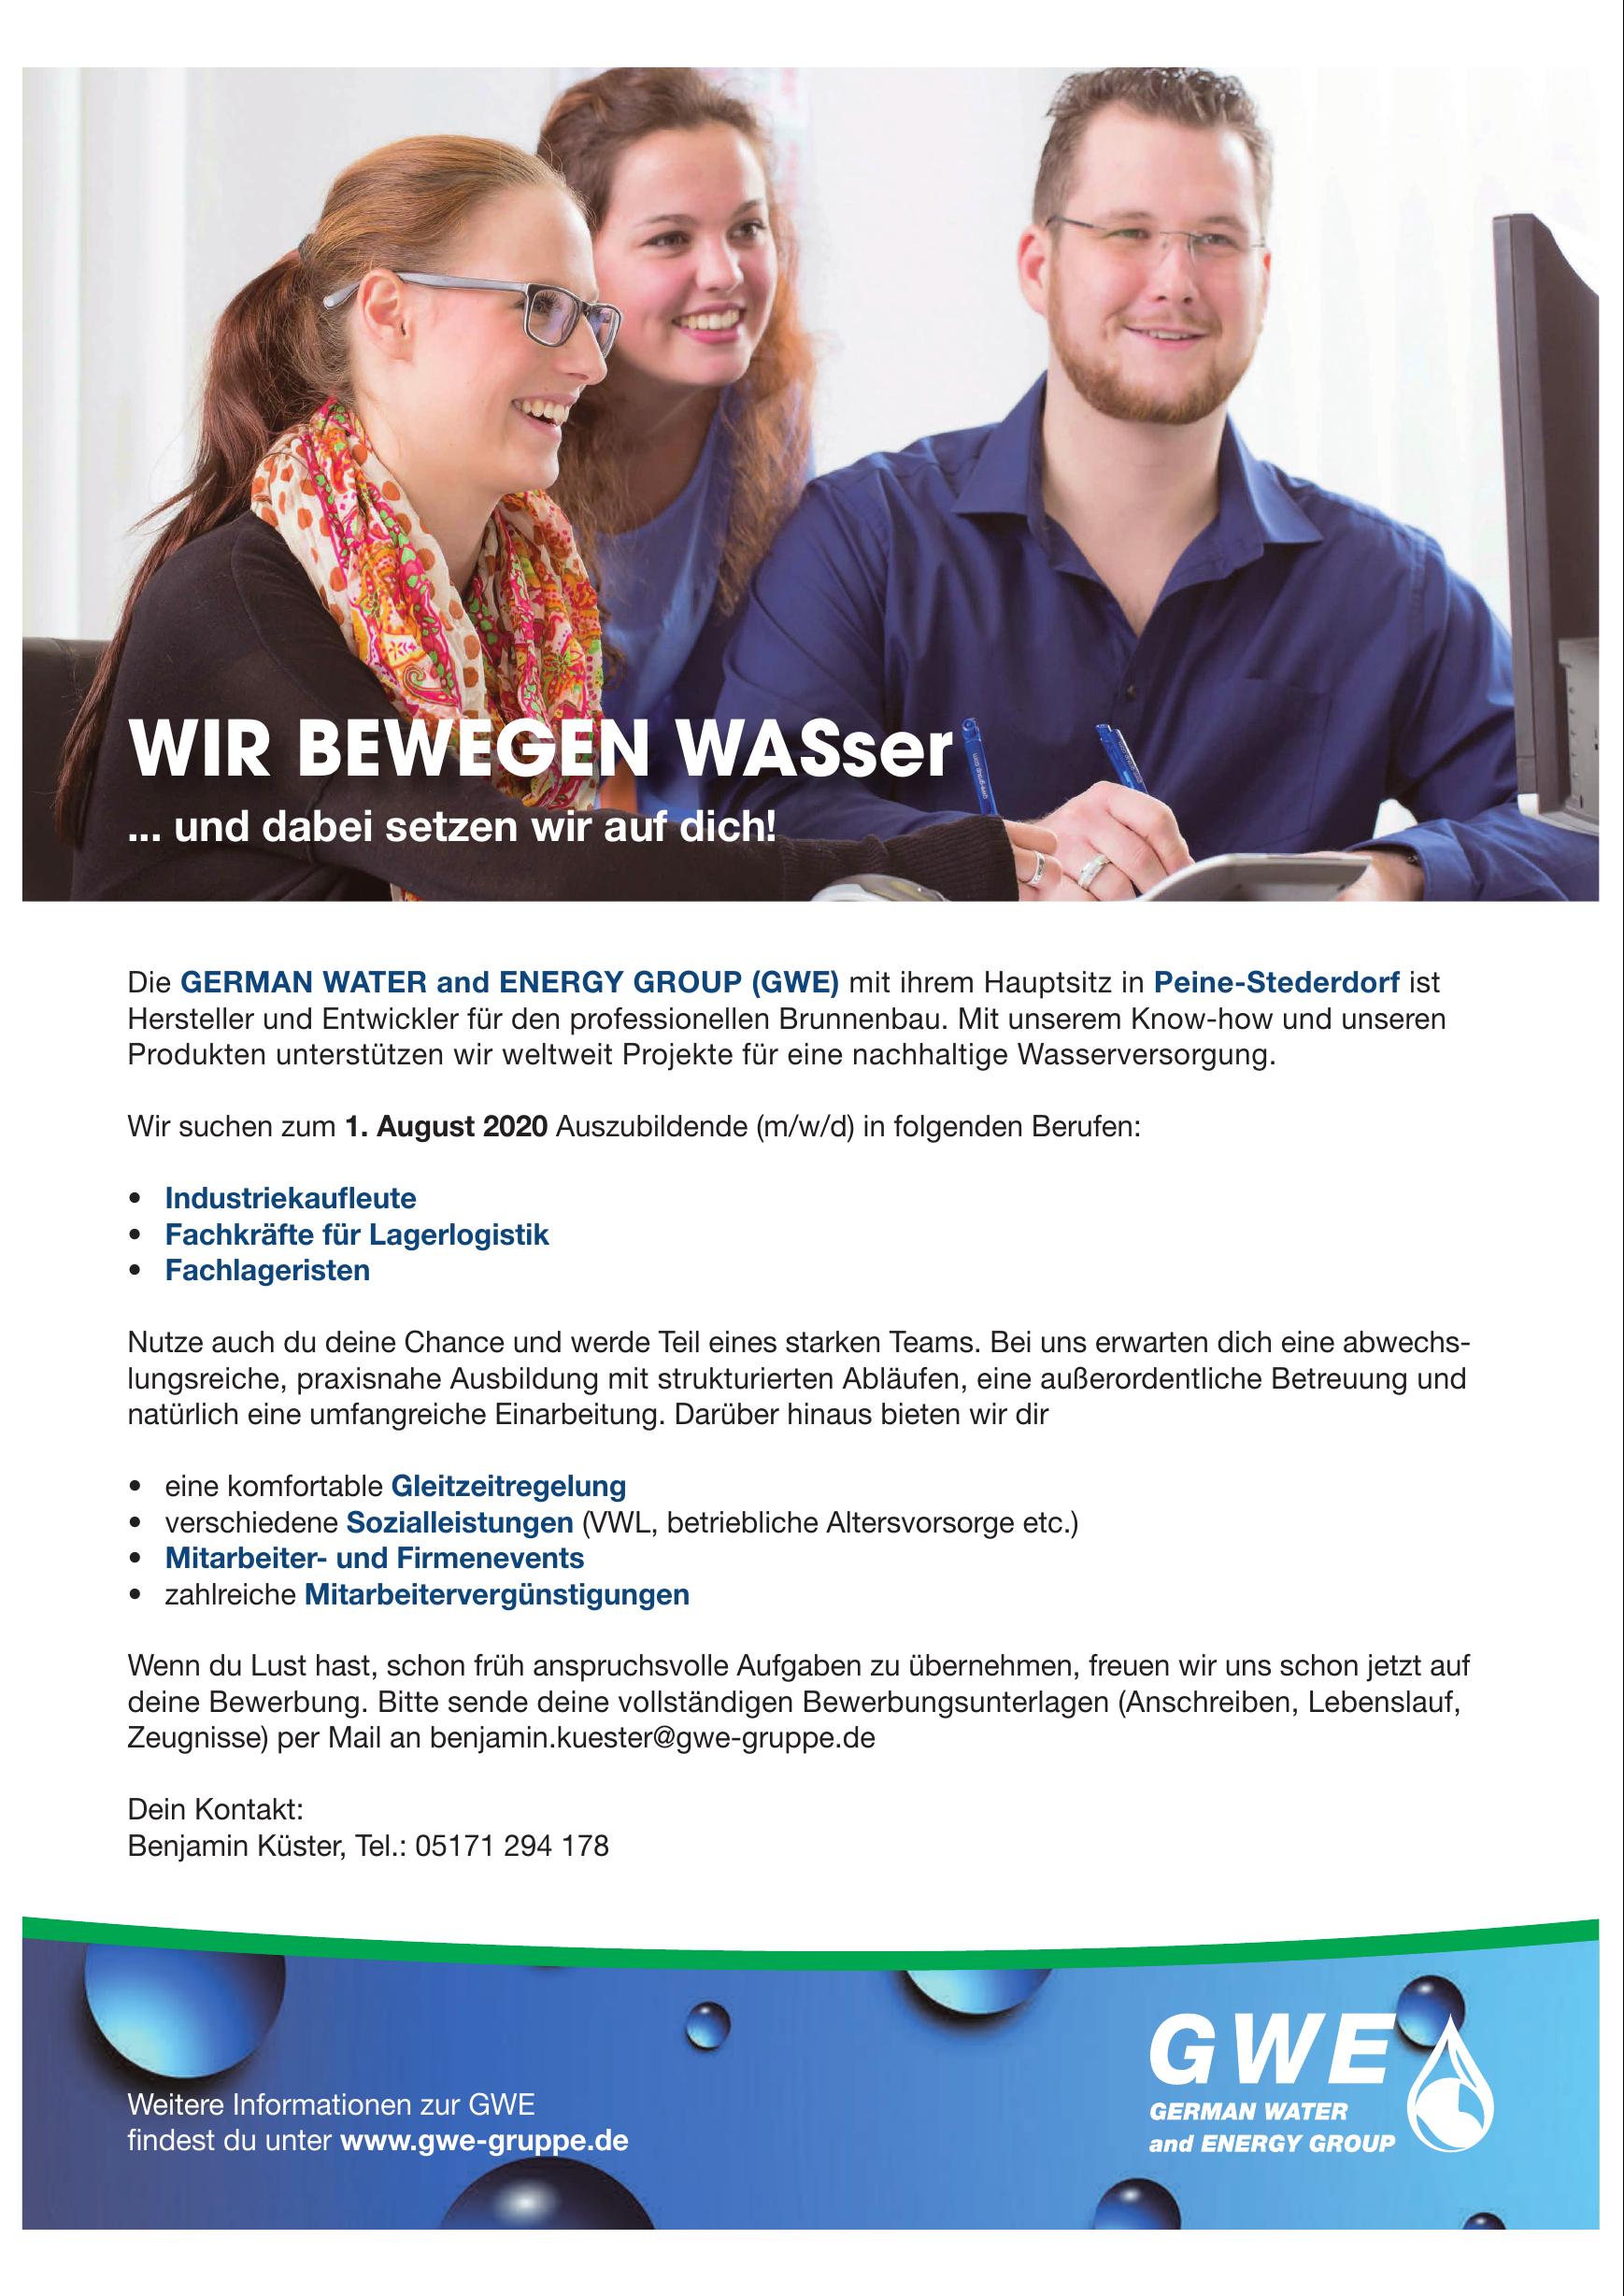 GWE pumpenboese GmbH